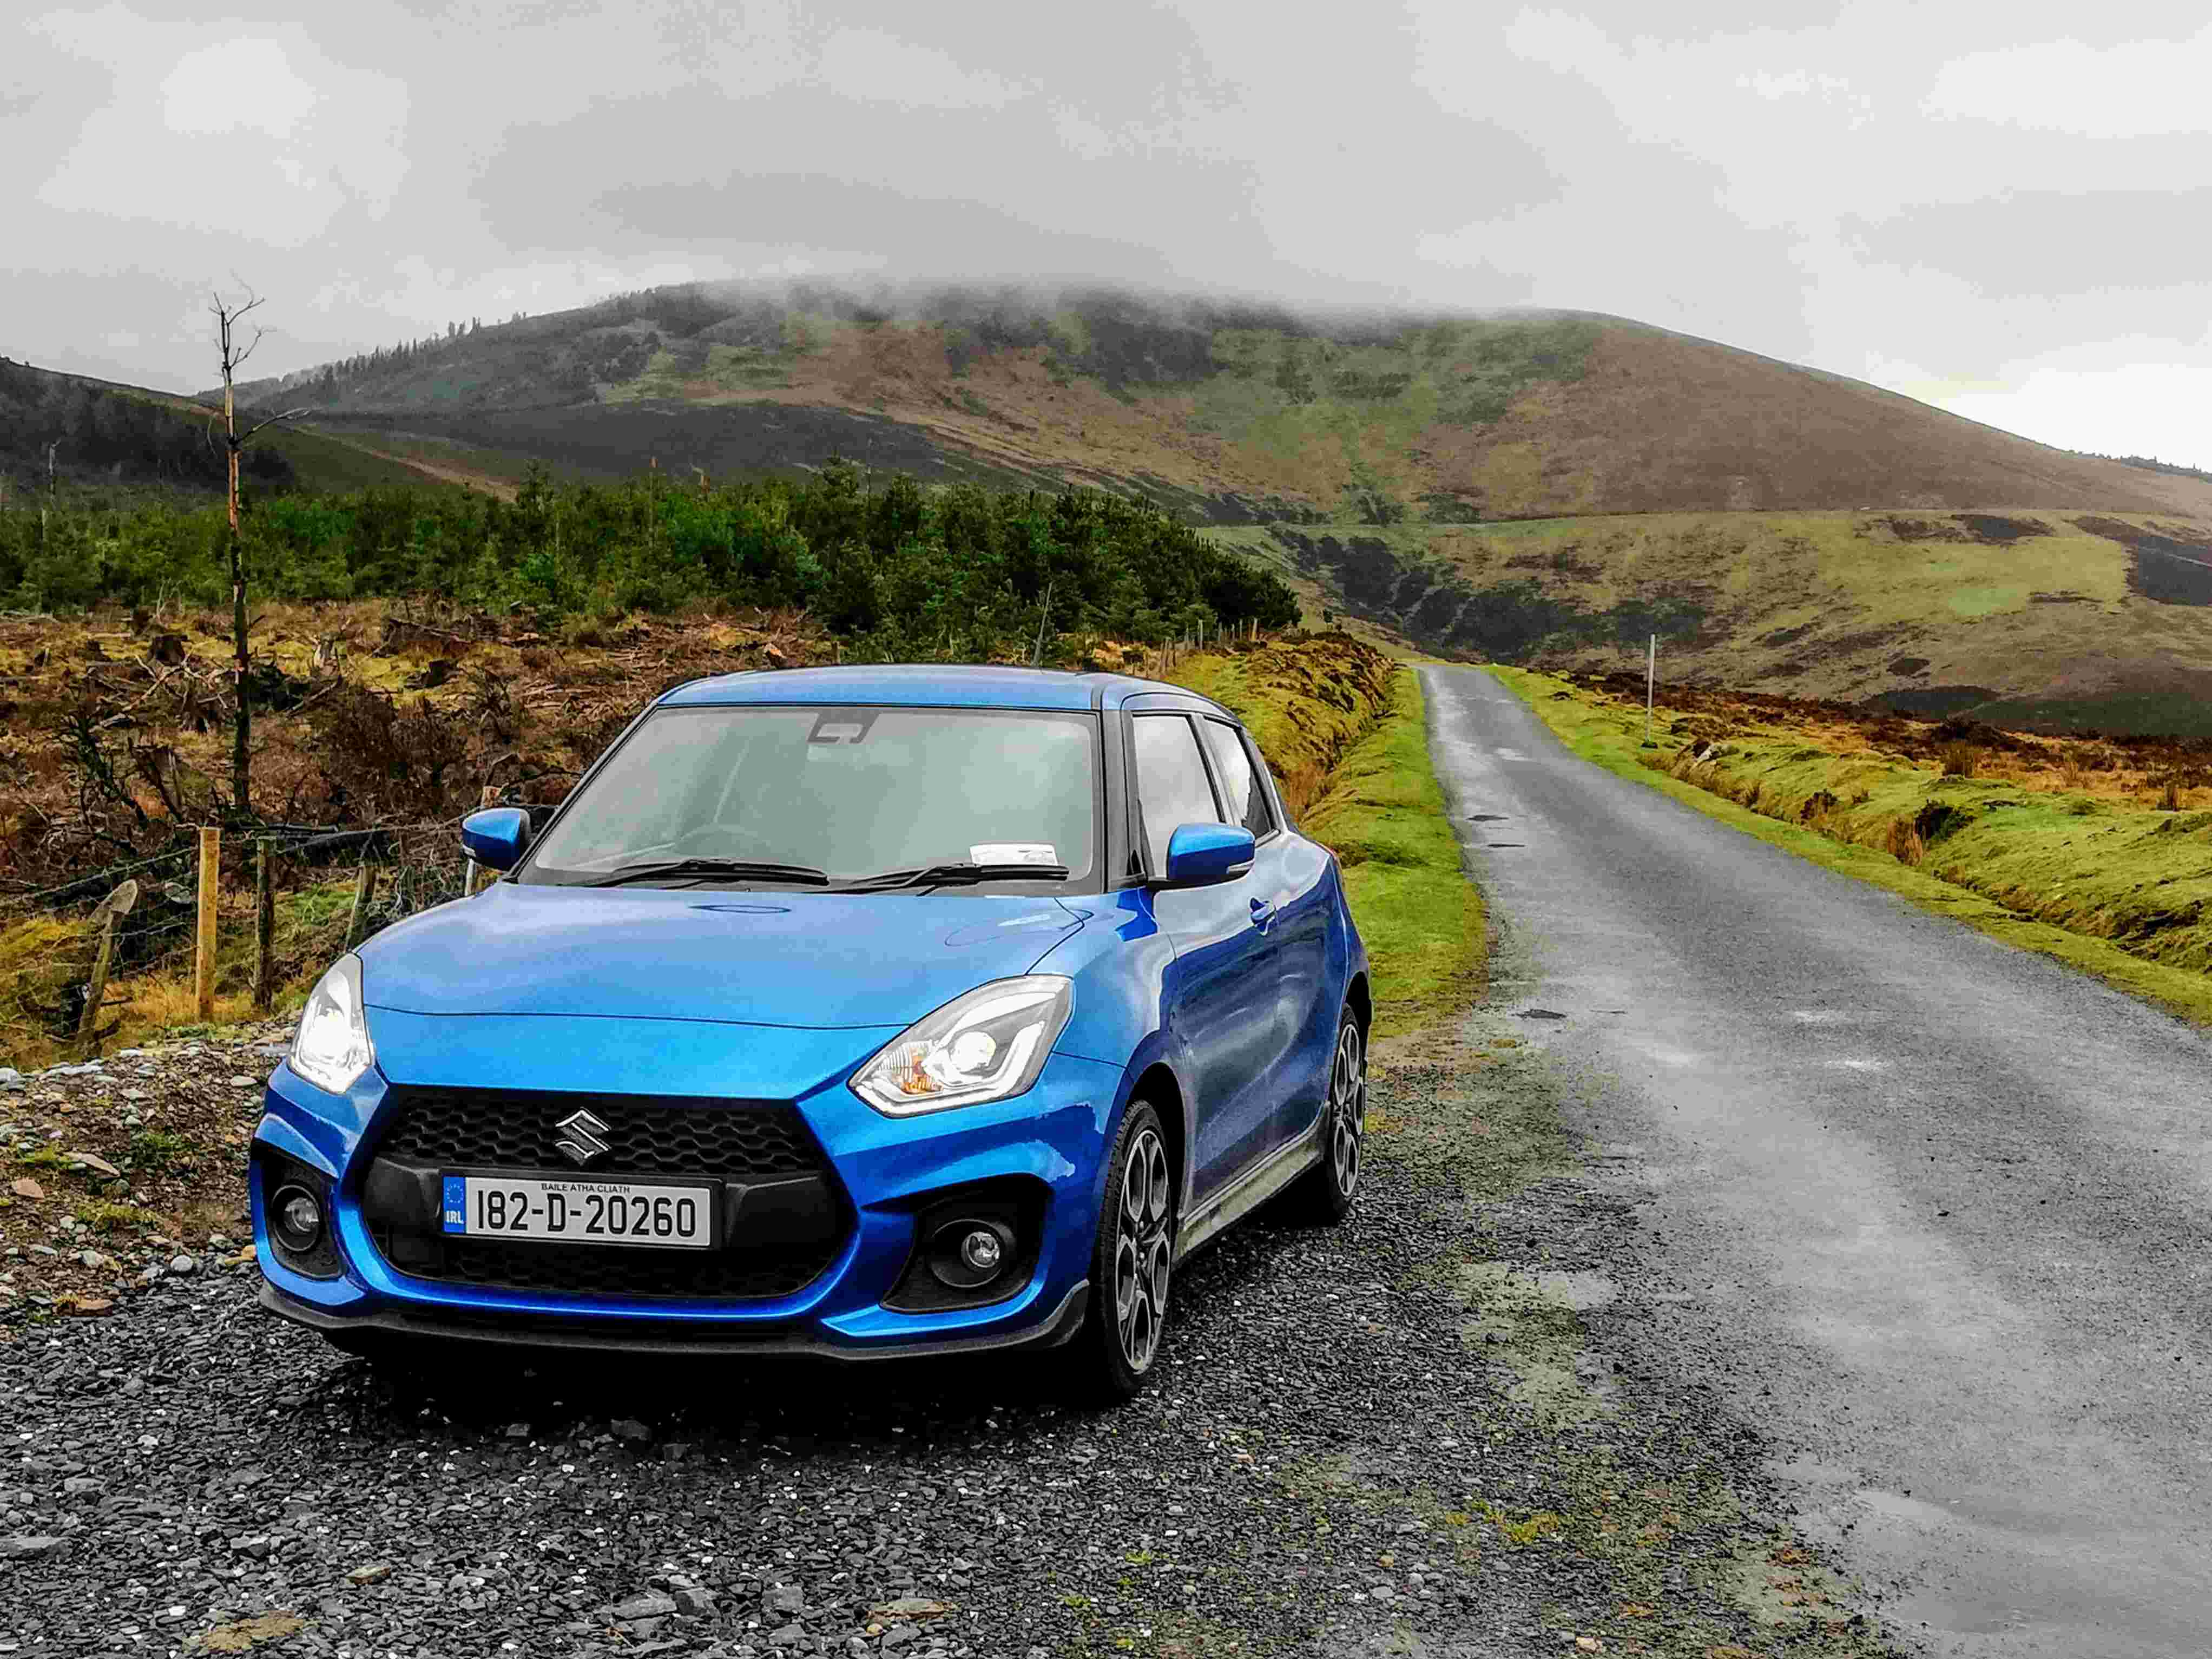 2019 Suzuki Swift Sport 1 4 Boosterjet Review - Changing Lanes